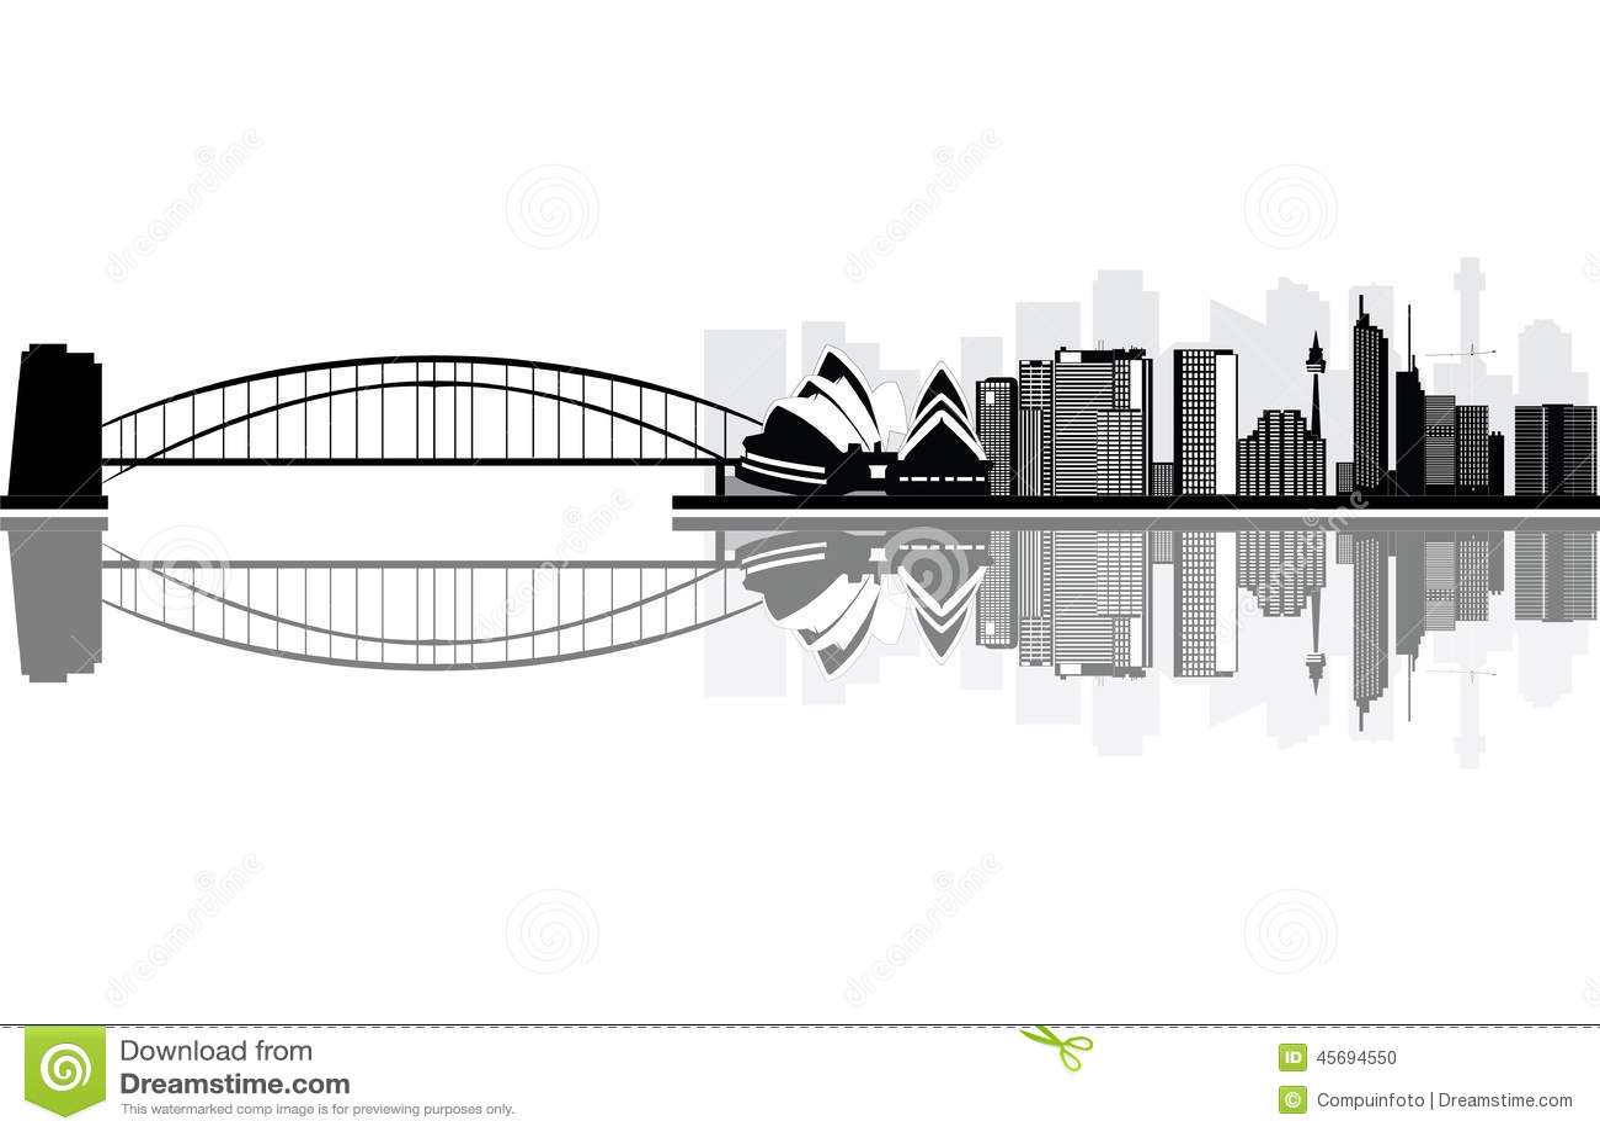 Sydney australian city skyline black and white.